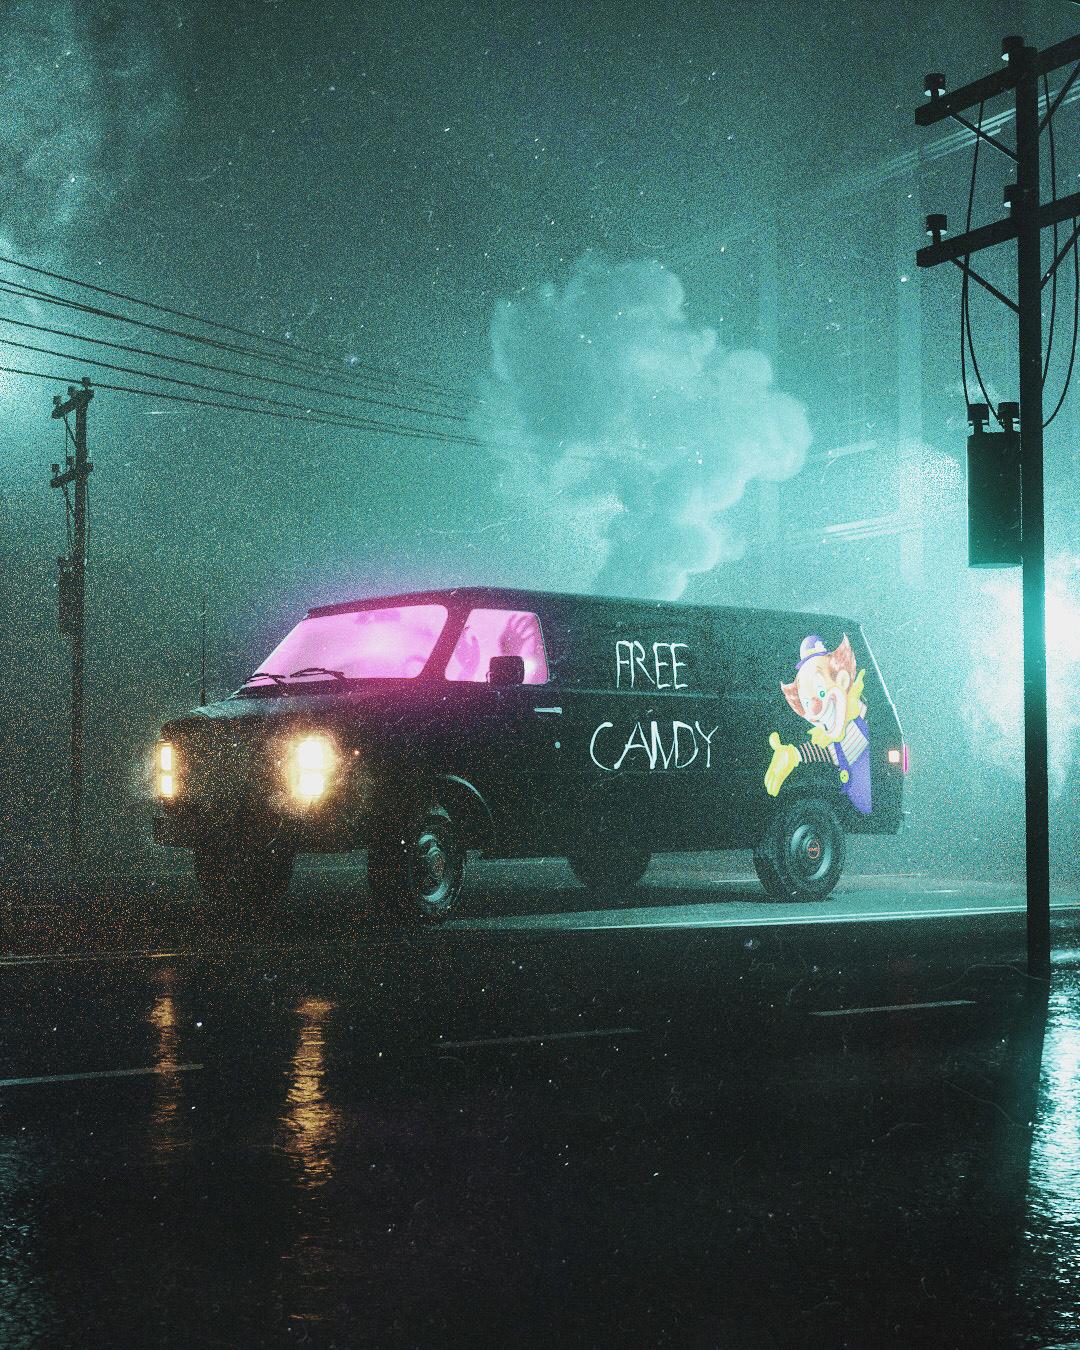 Cyberpunk Dystopia cinema4d octane Dangiuz altered carbon sci-fi vaporwave blade runner Neon Noir